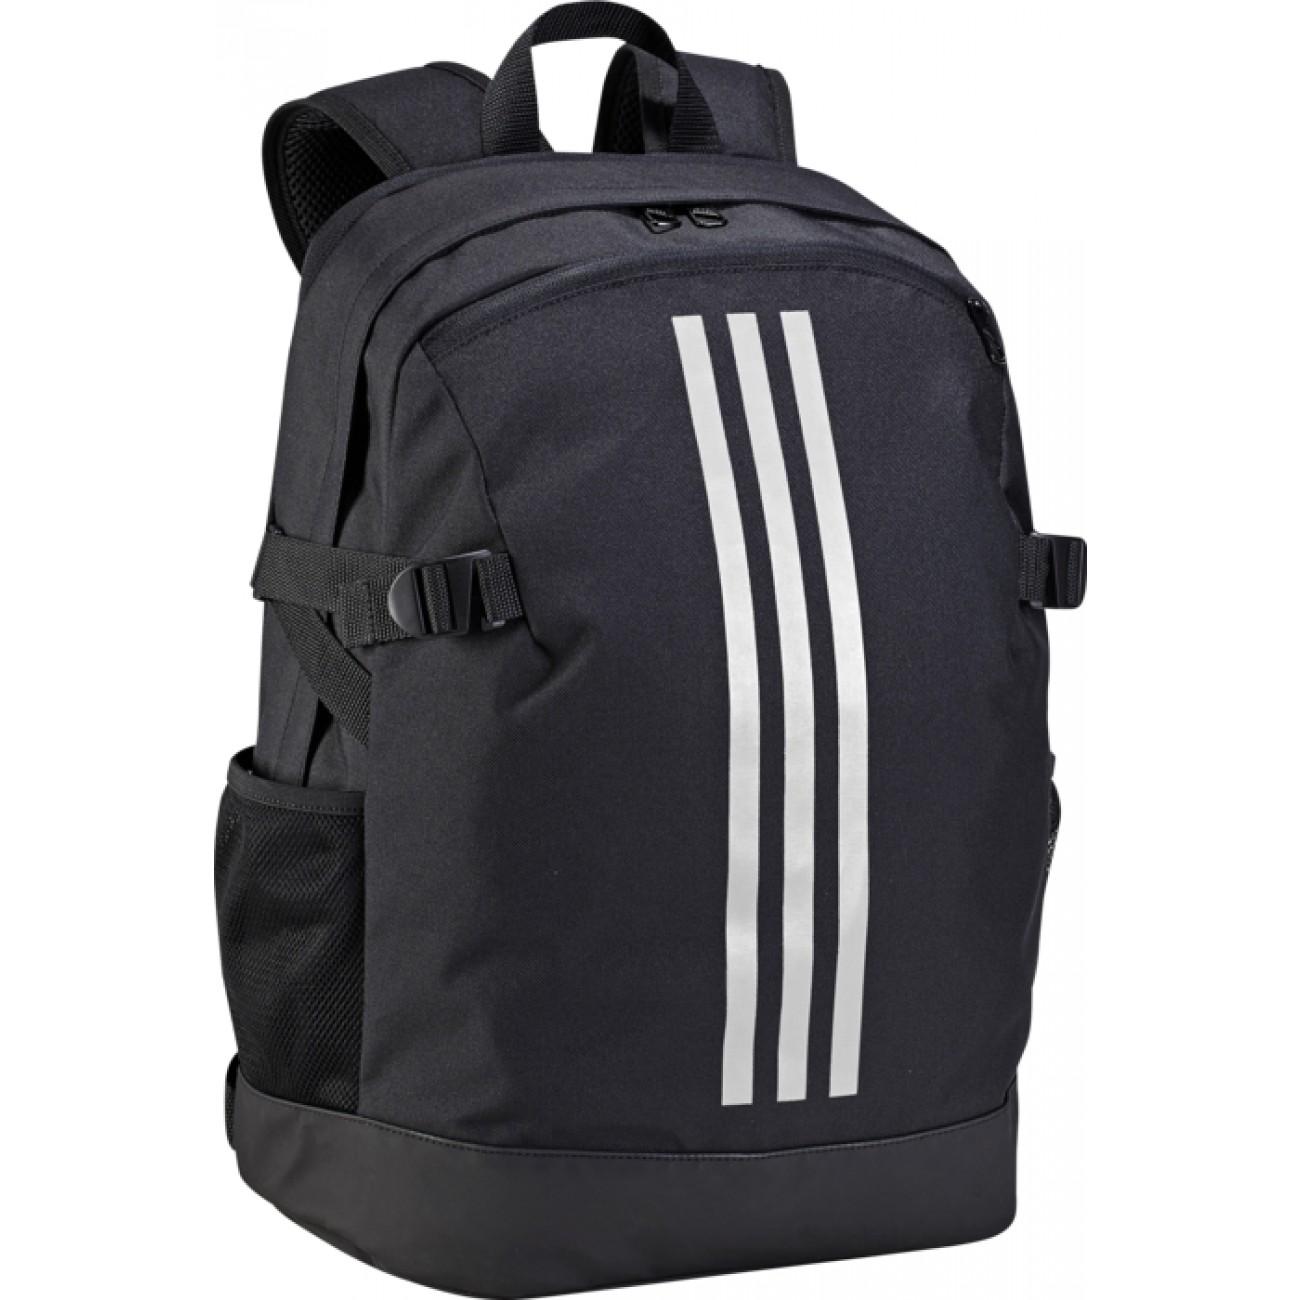 23 Power Adidas Dos Sac Bp À Iv 99 M 7fb6yg